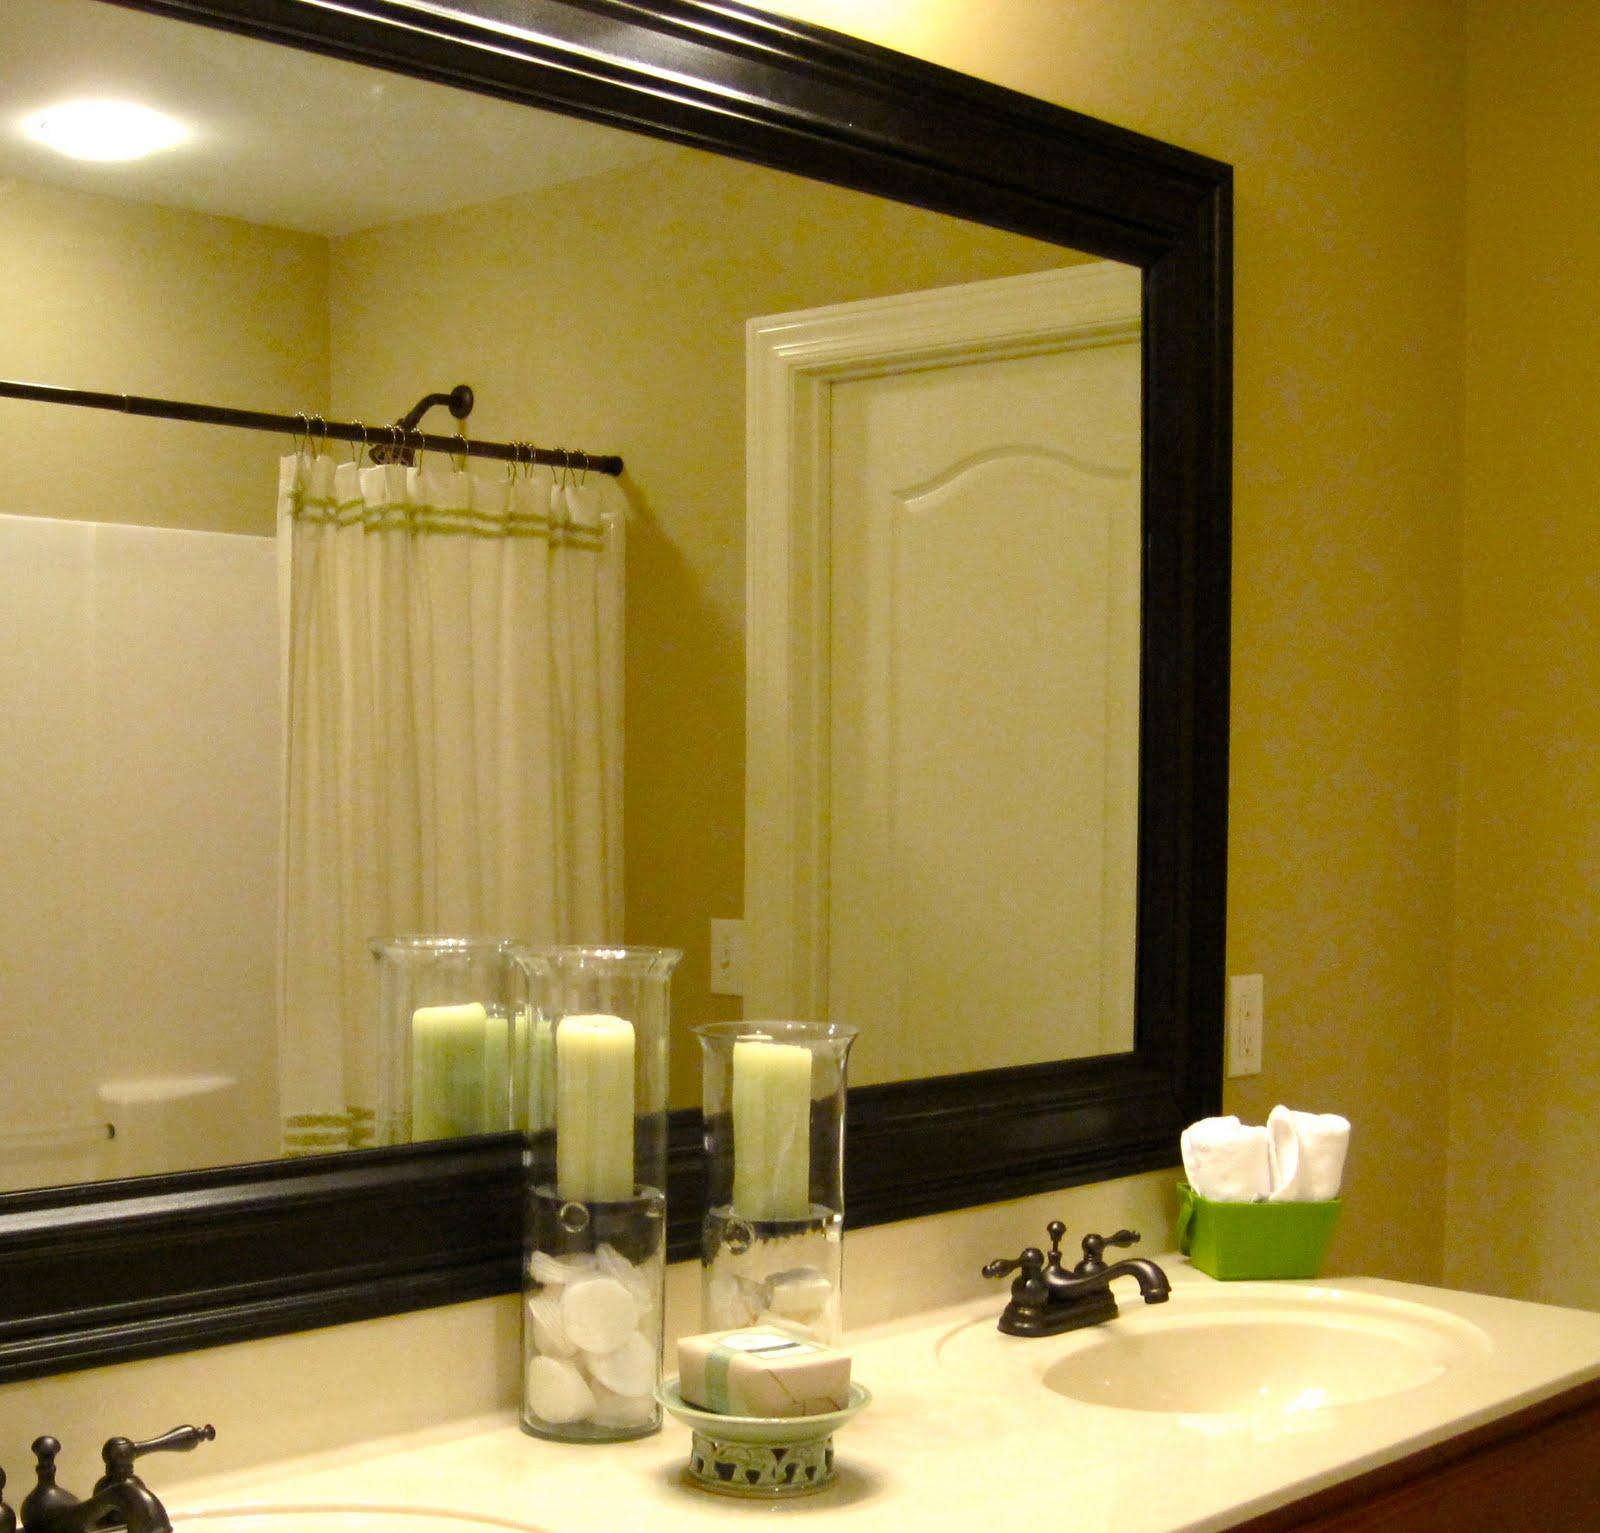 Bathroom Mirrors Design Roomraleigh kitchen cabinets Nice